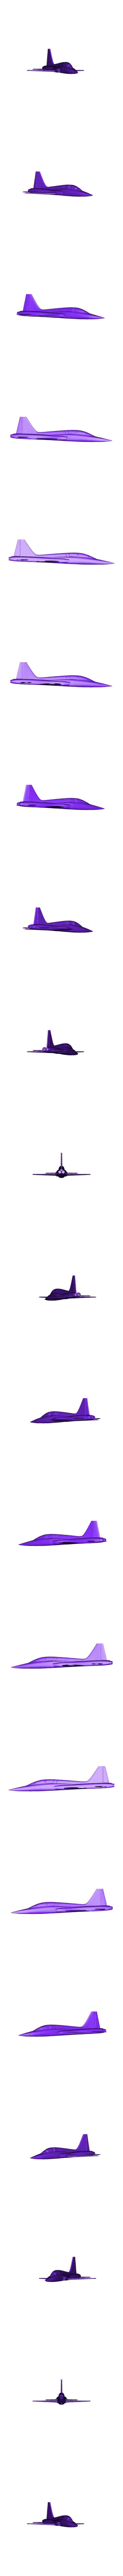 T38_Solid_Model.stl Download free STL file Easy to print T-38 Talon aircraft scale model (esc: 1/64) • Design to 3D print, guaro3d